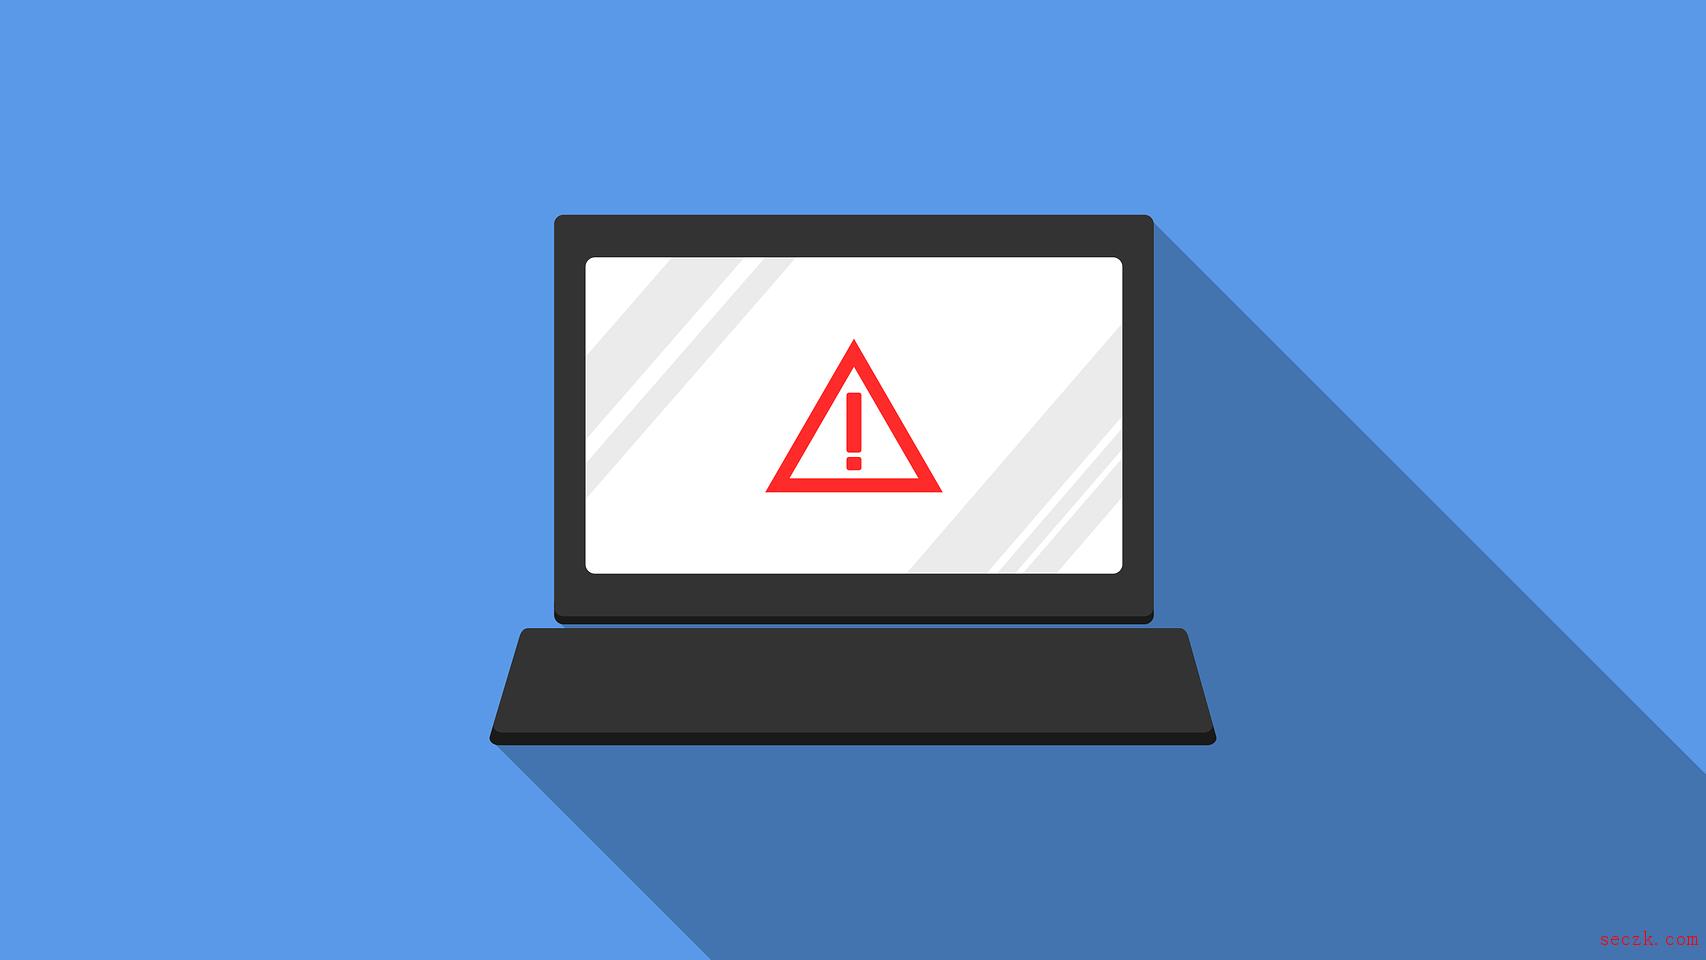 Windows 静默更新修复新发现的英特尔 CPU 预测执行漏洞